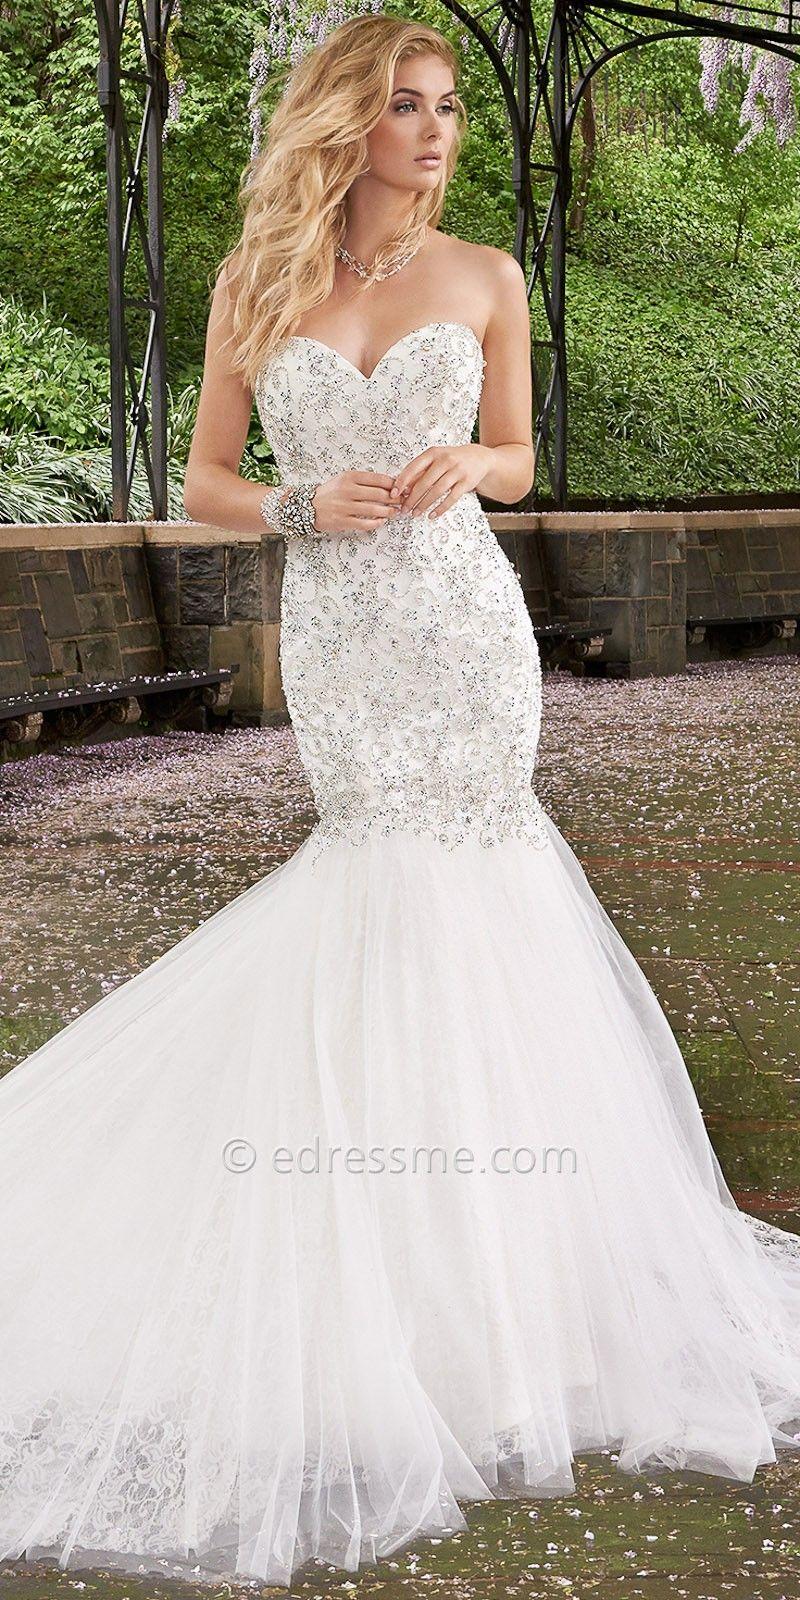 Rhinestone Drop Waist Wedding Dresses by Camille La Vie | Weddings ...